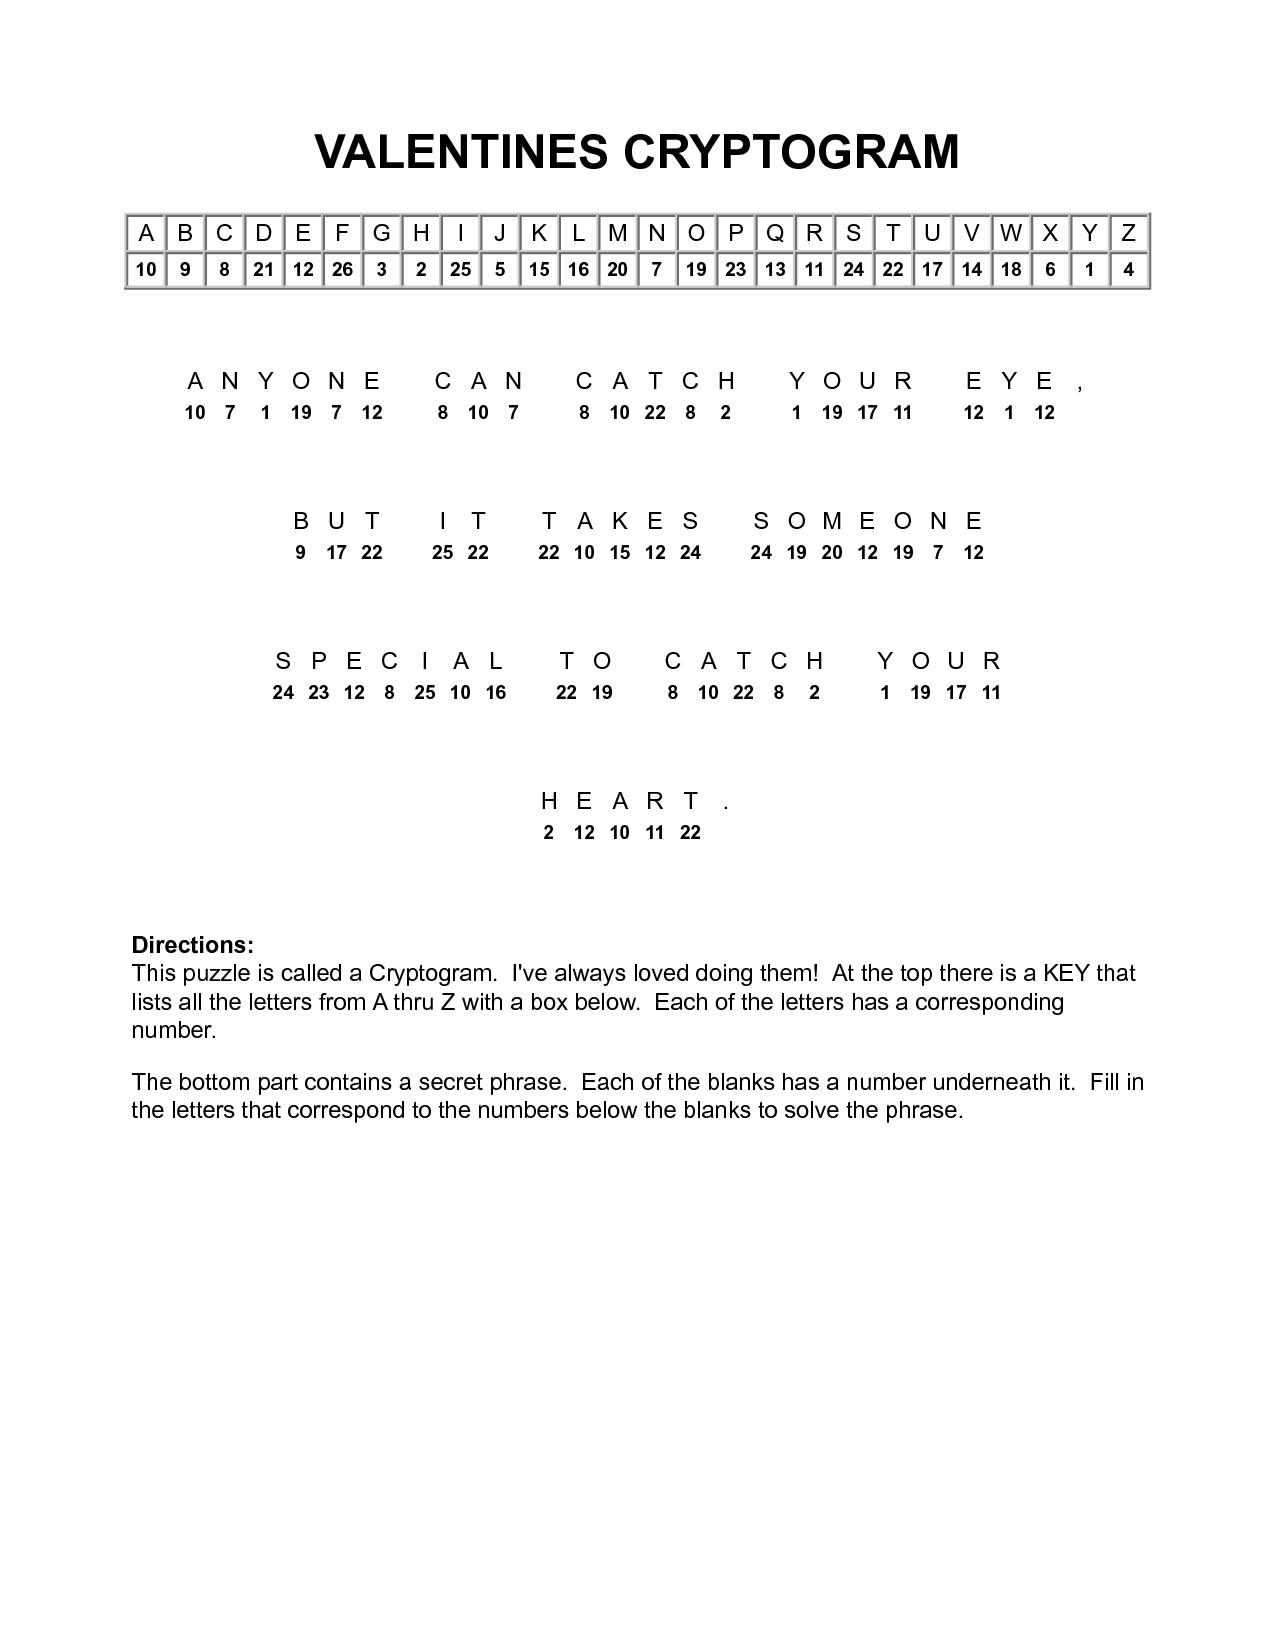 Valentine Cryptograms To Print | Valentines Cryptogram | Puzzles - Printable Puzzles Cryptograms